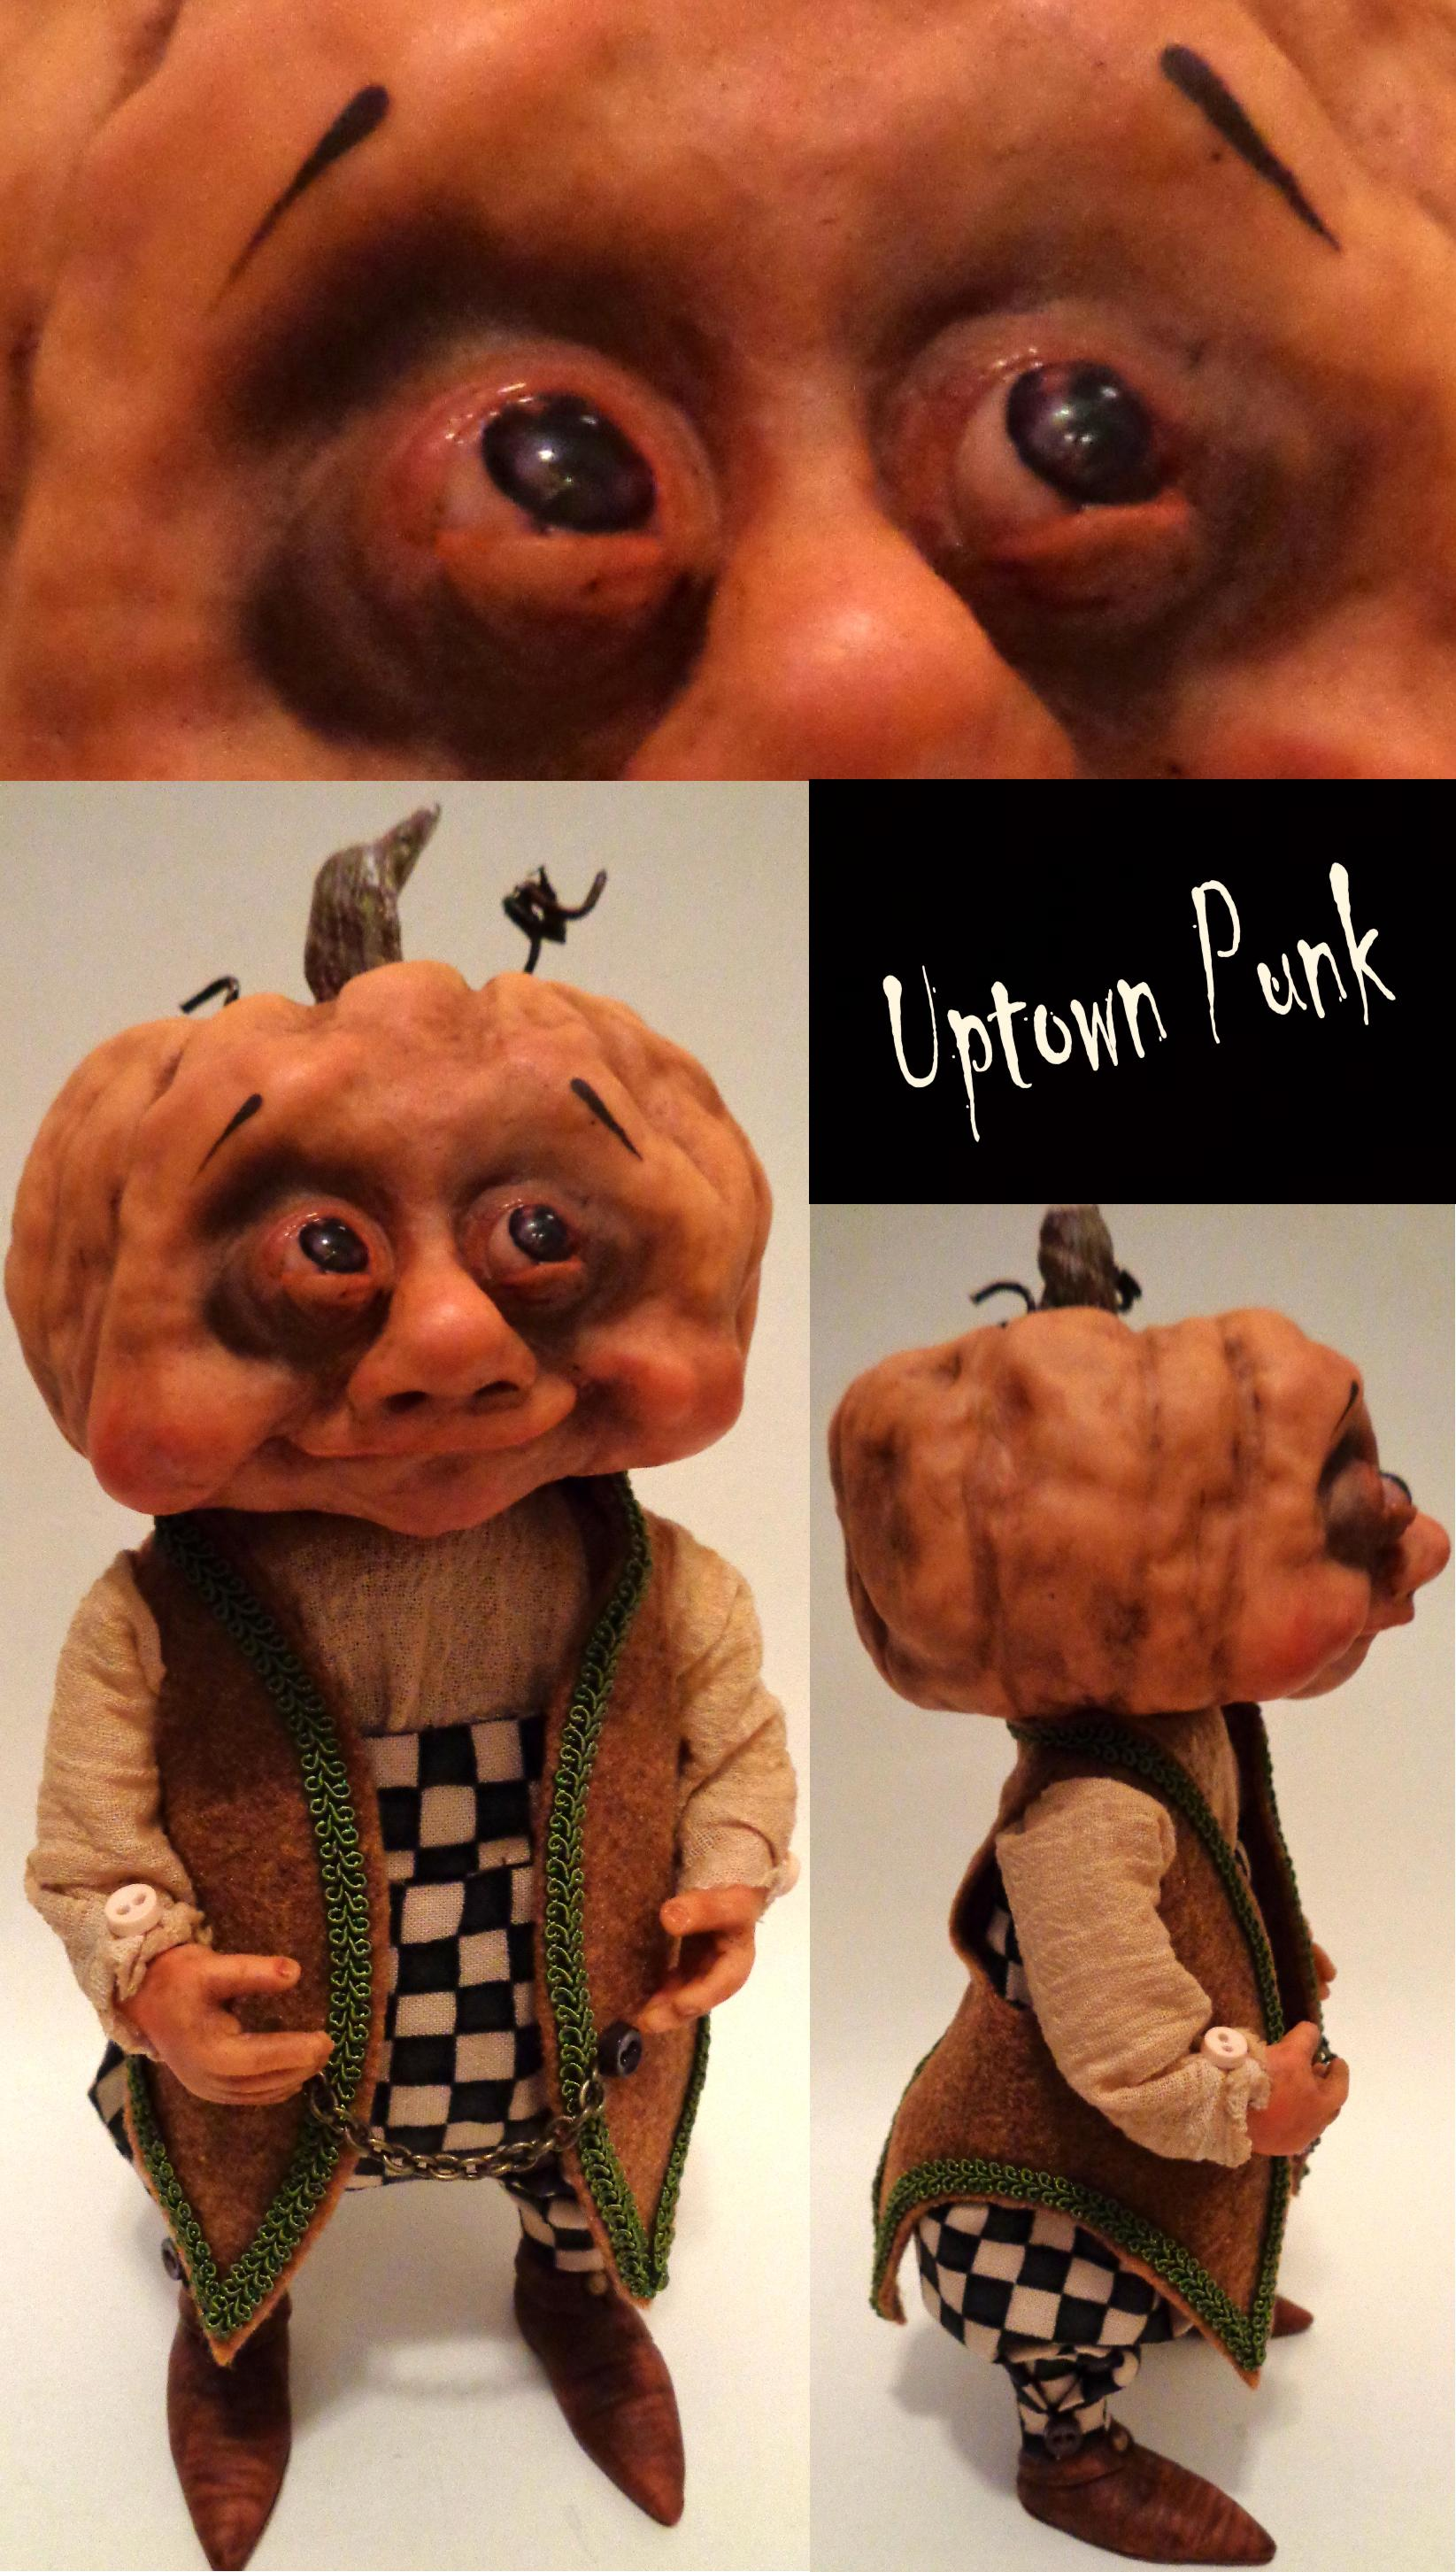 Uptown Punk for Web Site - Denise Bledsoe